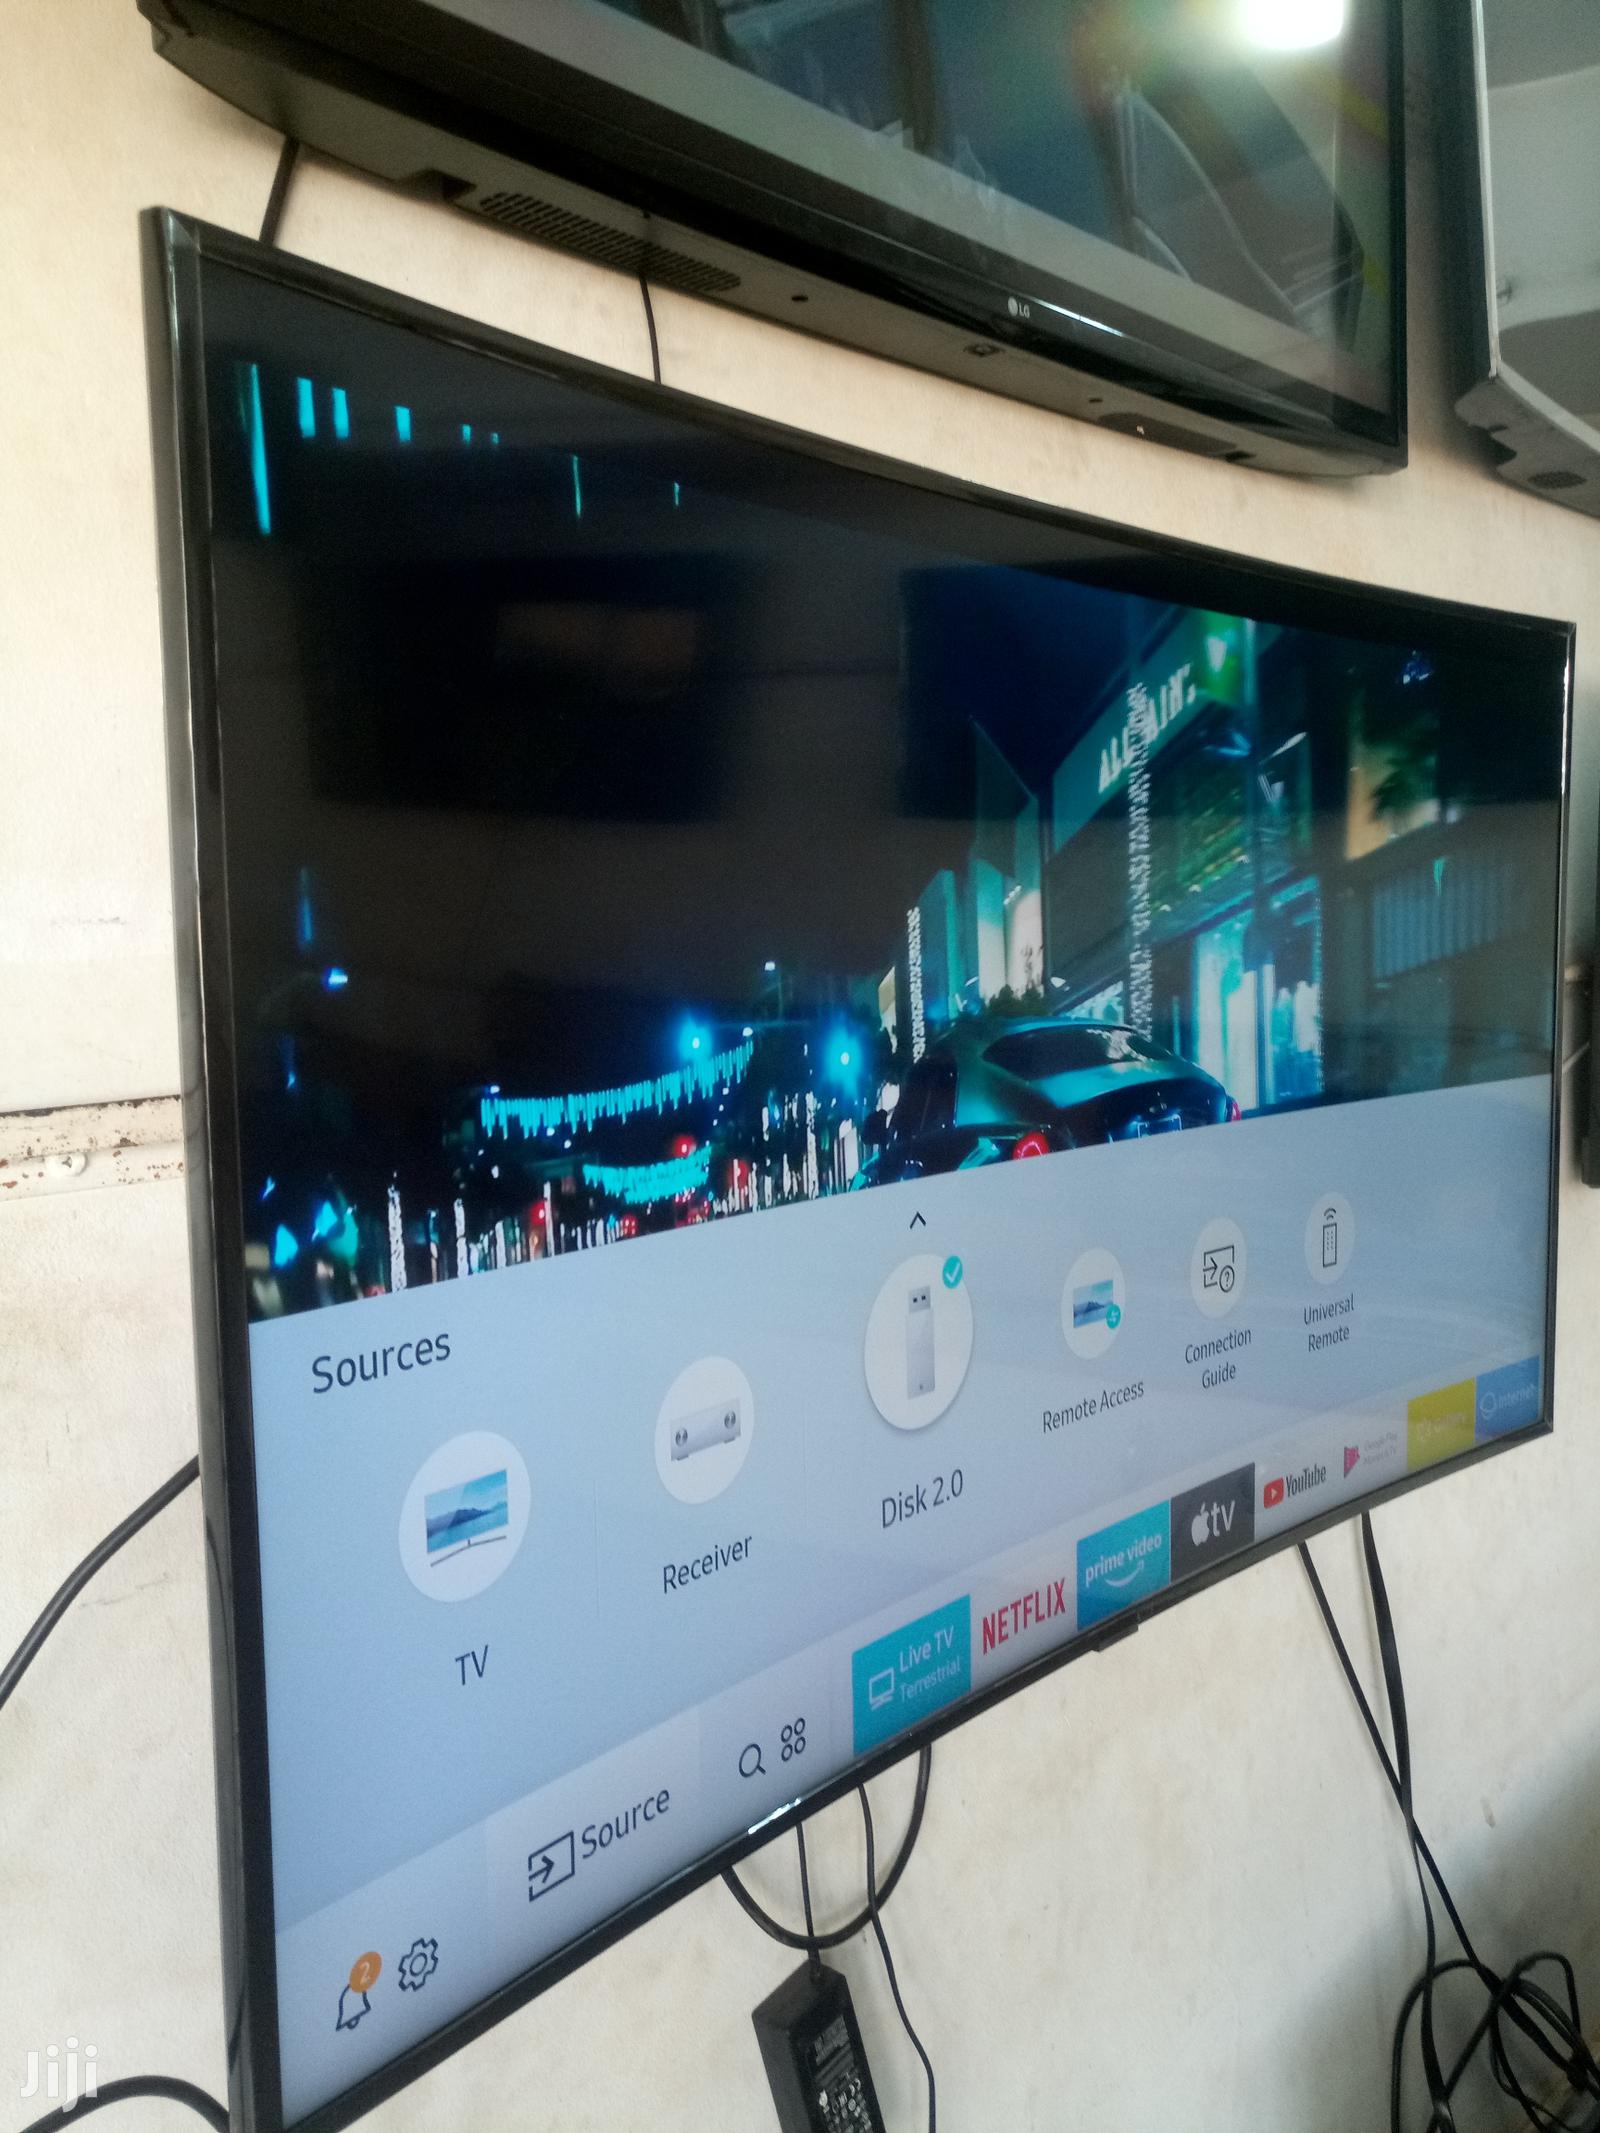 Samsung Curved RU Smart UHD 4k Digital TV 55 Inches | TV & DVD Equipment for sale in Kampala, Central Region, Uganda